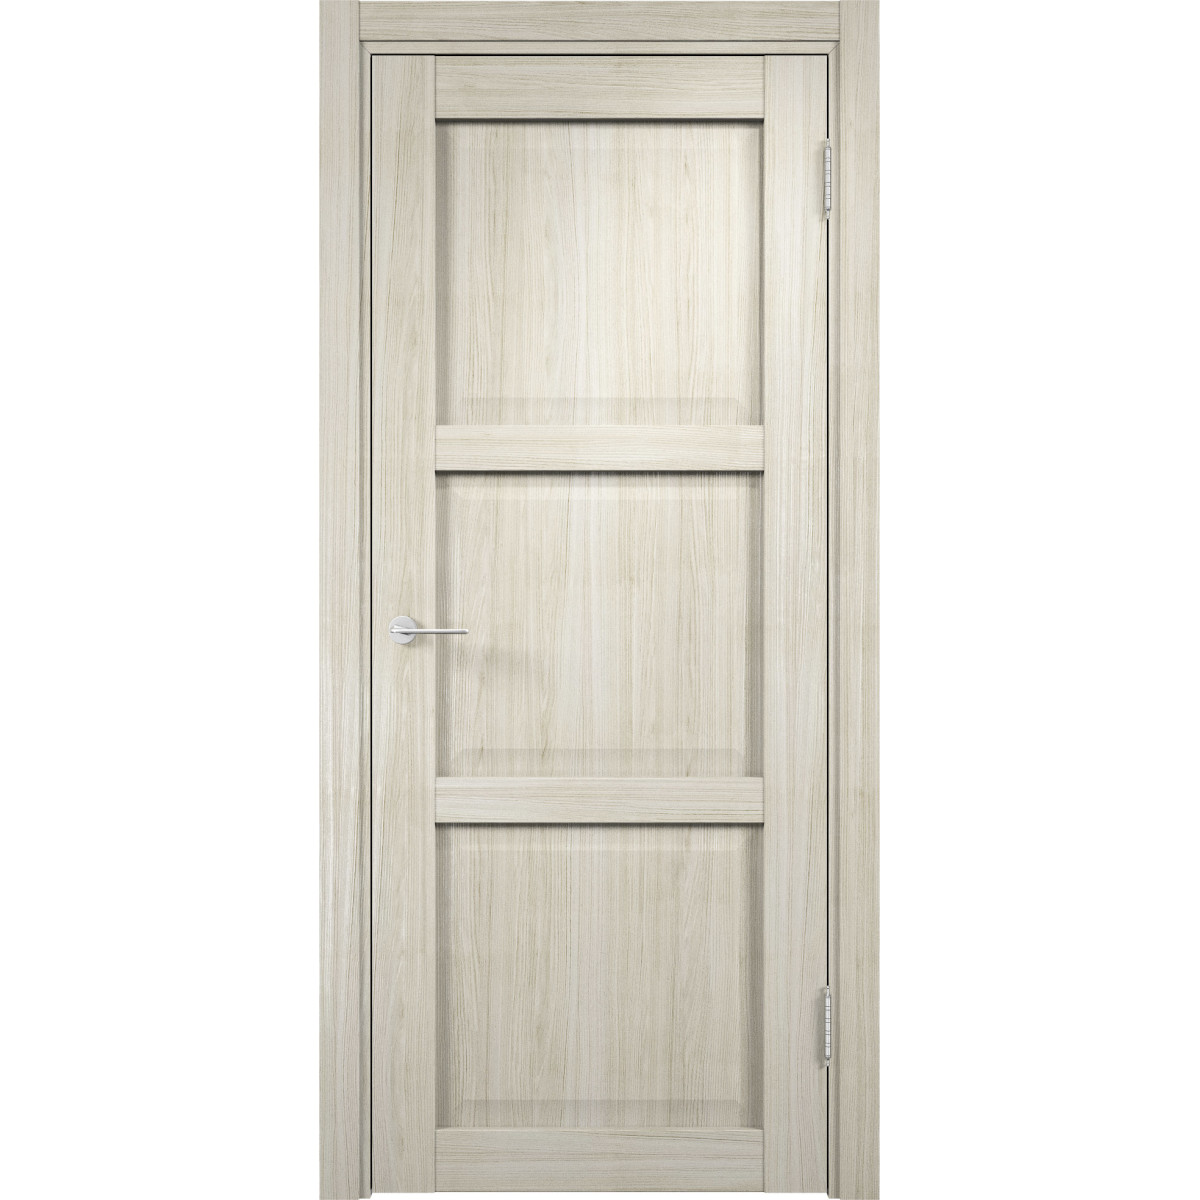 Дверное полотно Casaporte Рома МП_0093 2000х800х44 мм МДФ